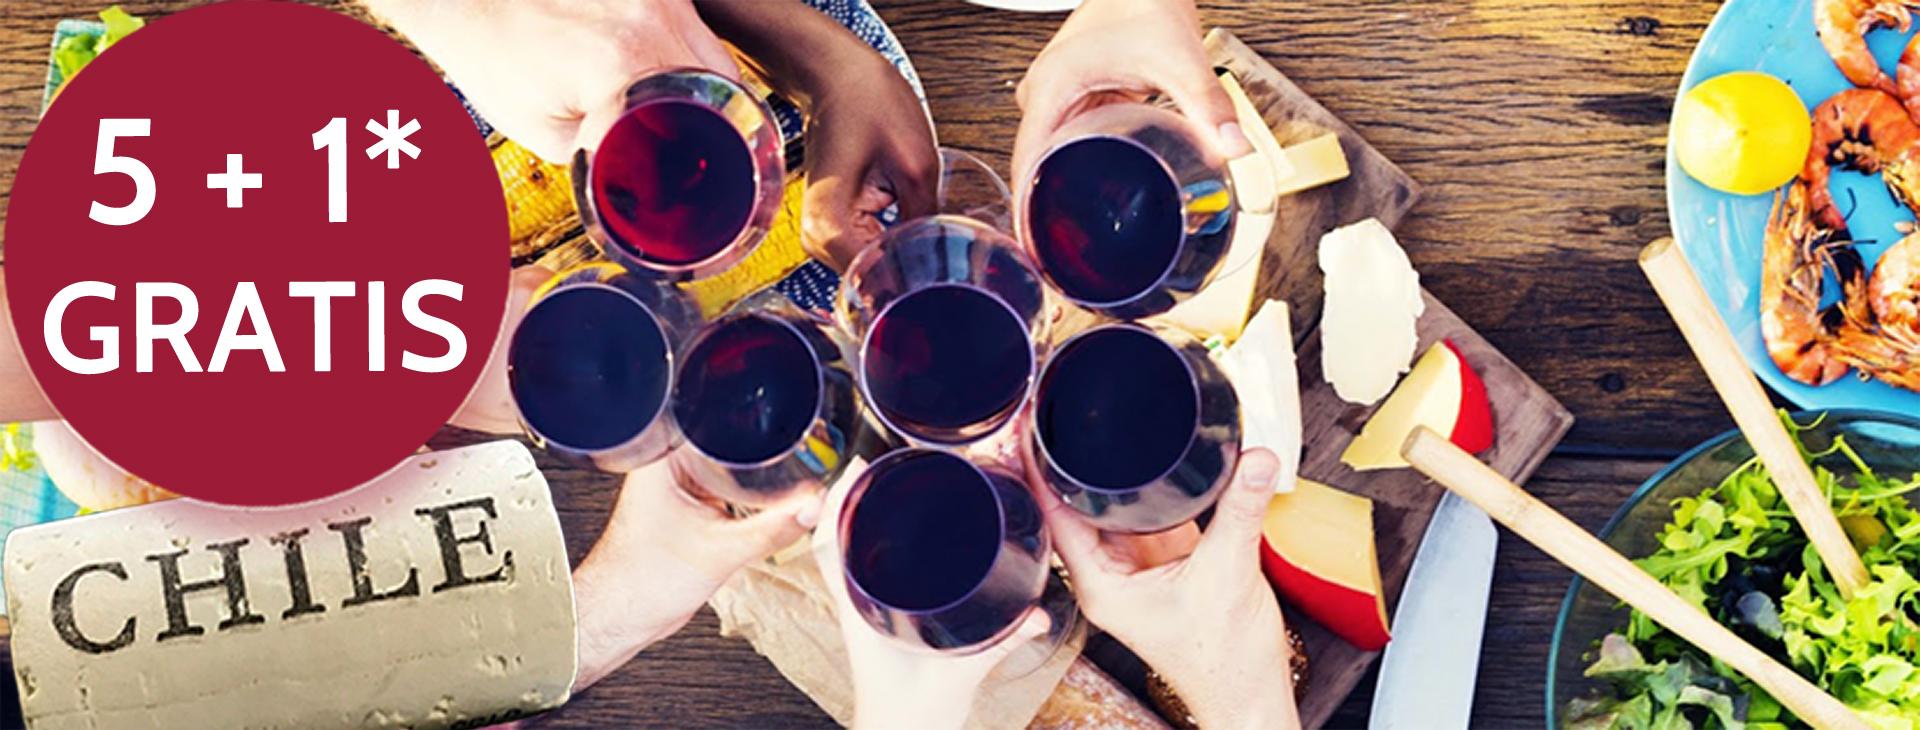 Promo Chileense wijnen